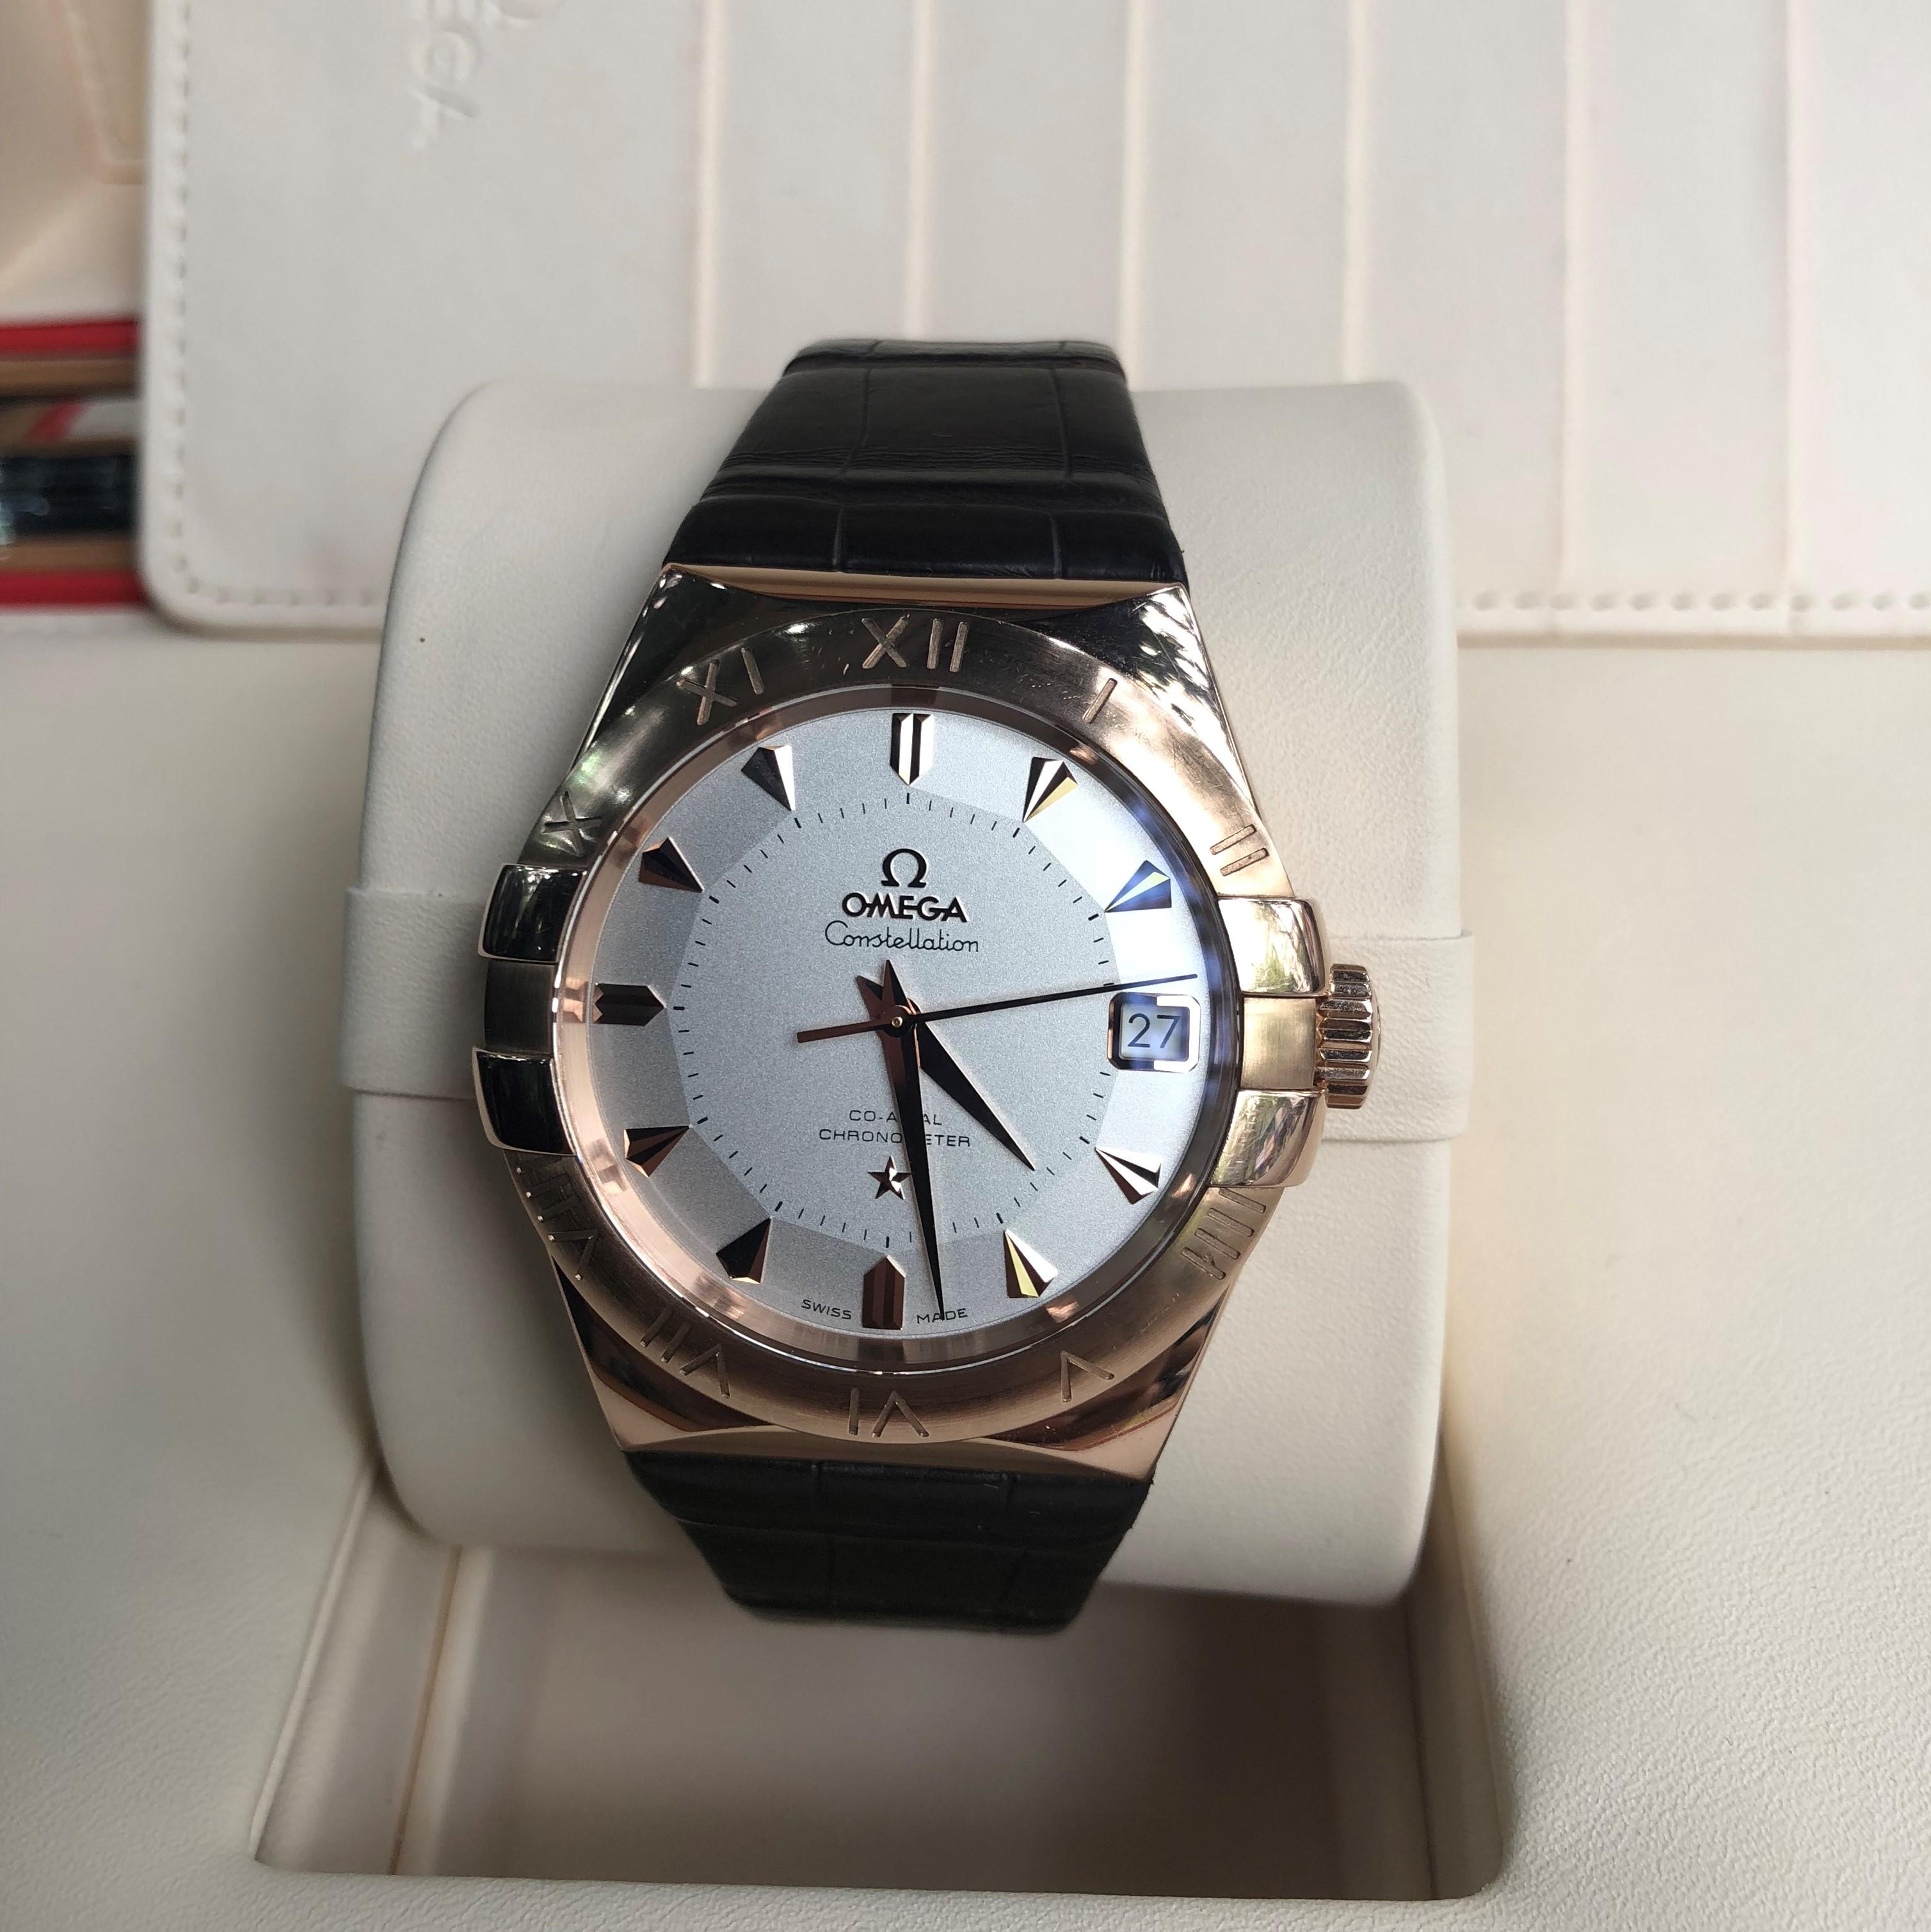 omega constellation limited 1952 vàng hồng 18k size 38mm